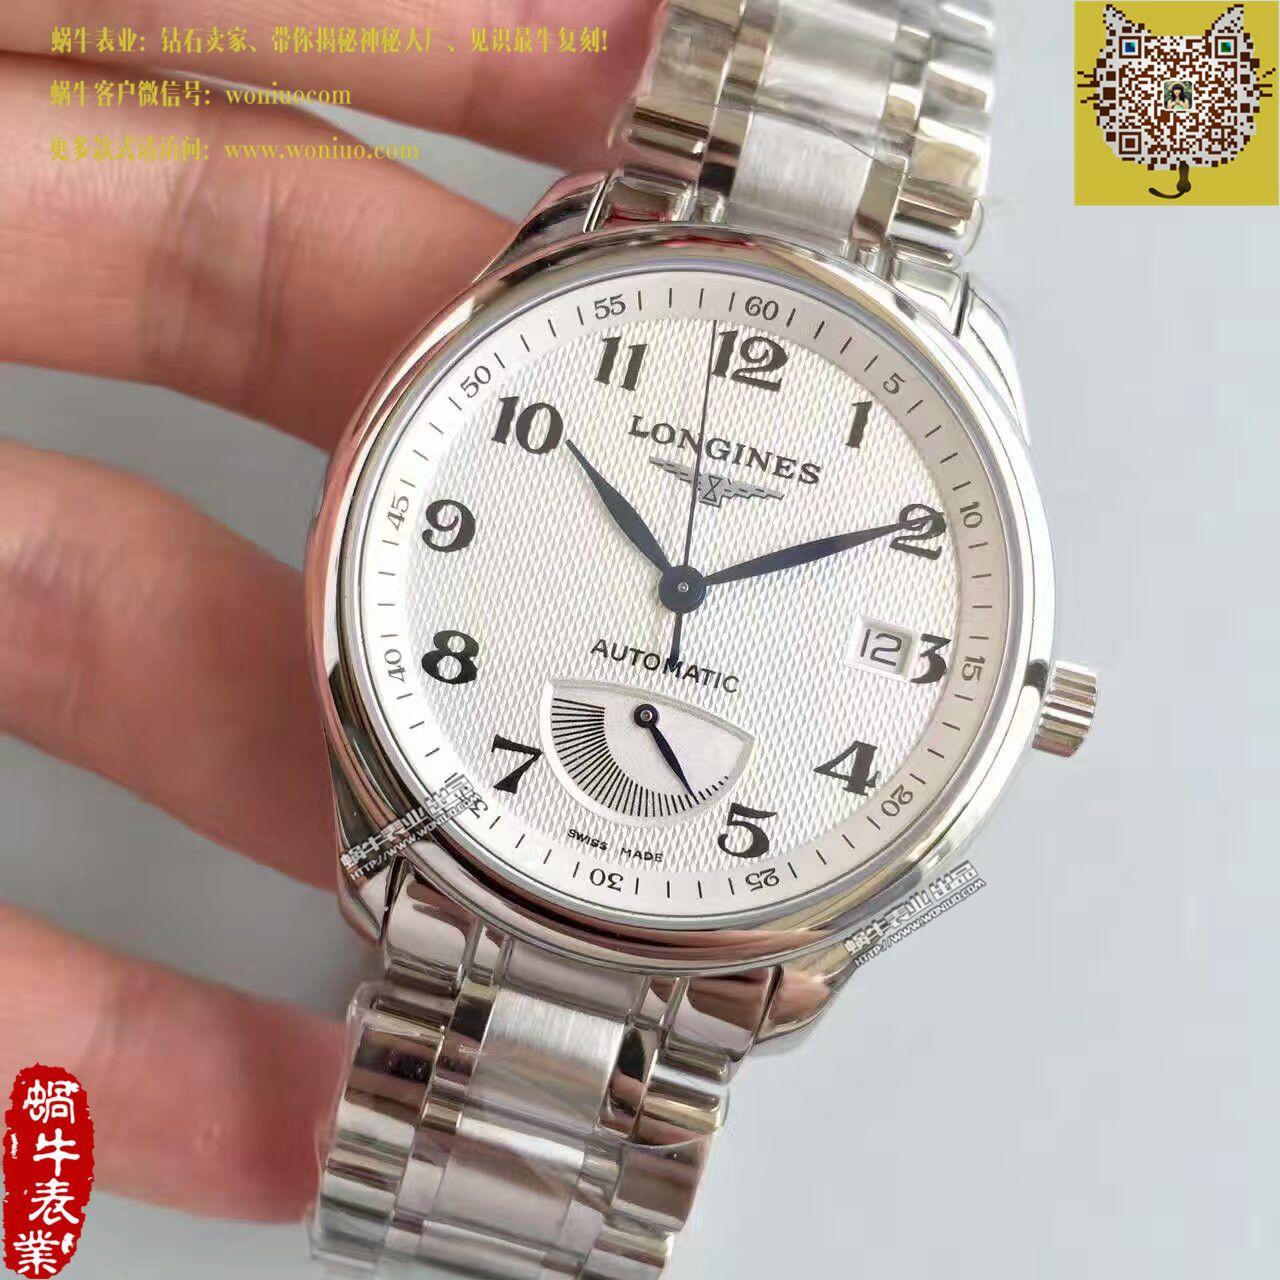 【MK厂1比1超A复刻手表】浪琴制表传统系列L2.708.4.78.3腕表 / L081